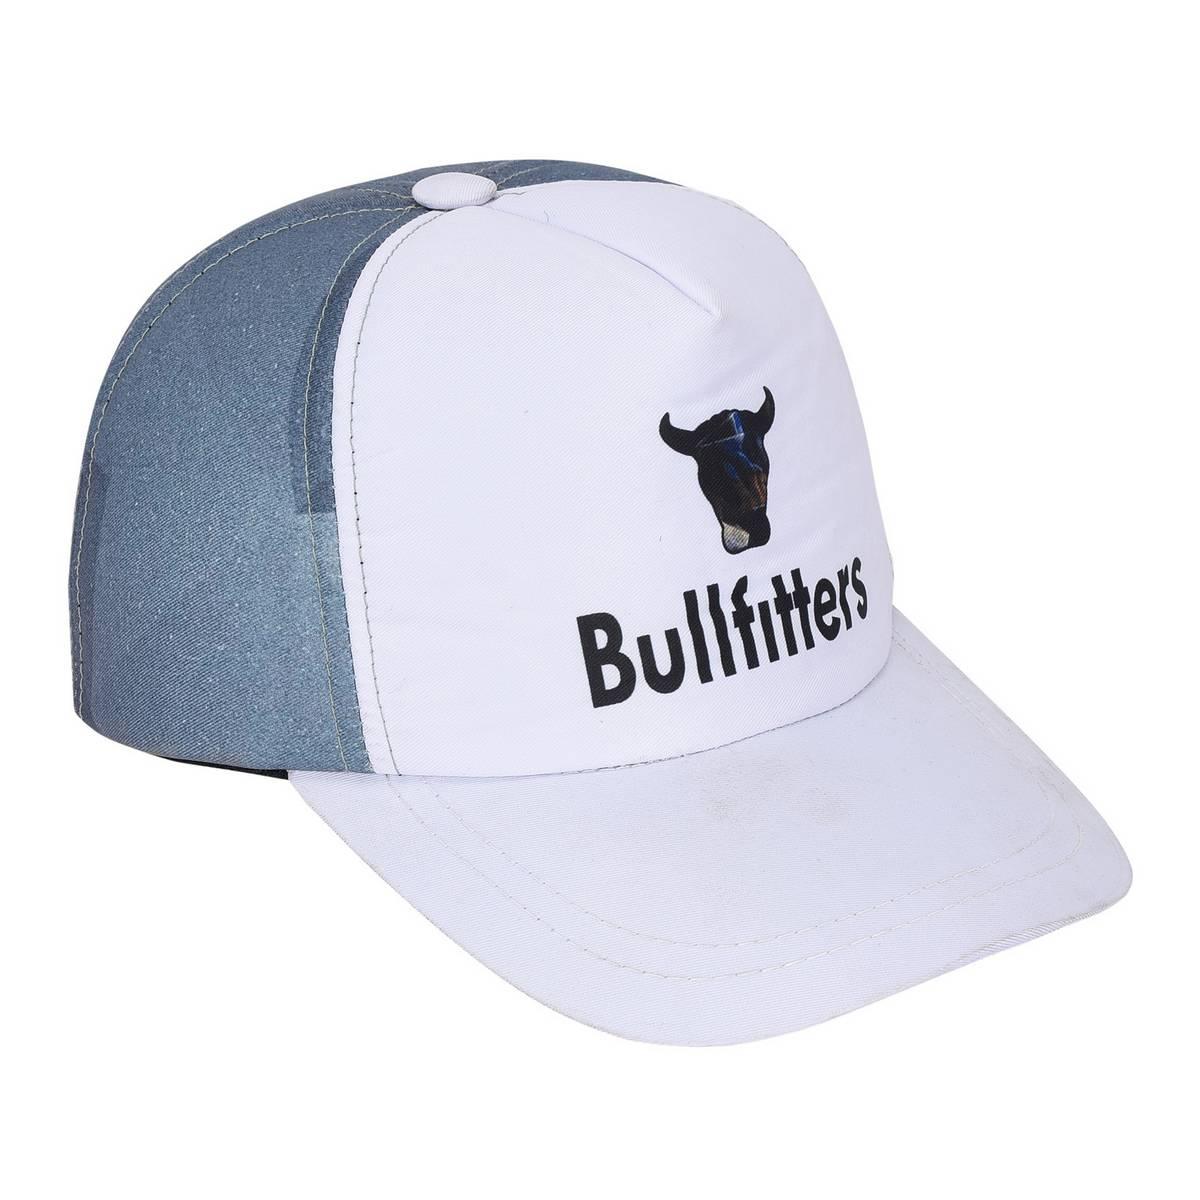 Bullfitters Head Wear Sun Hat Cap Race High Performance Running/Outdoor Sports Hat Baseball Cap Visor Cap- Sublimated Cap